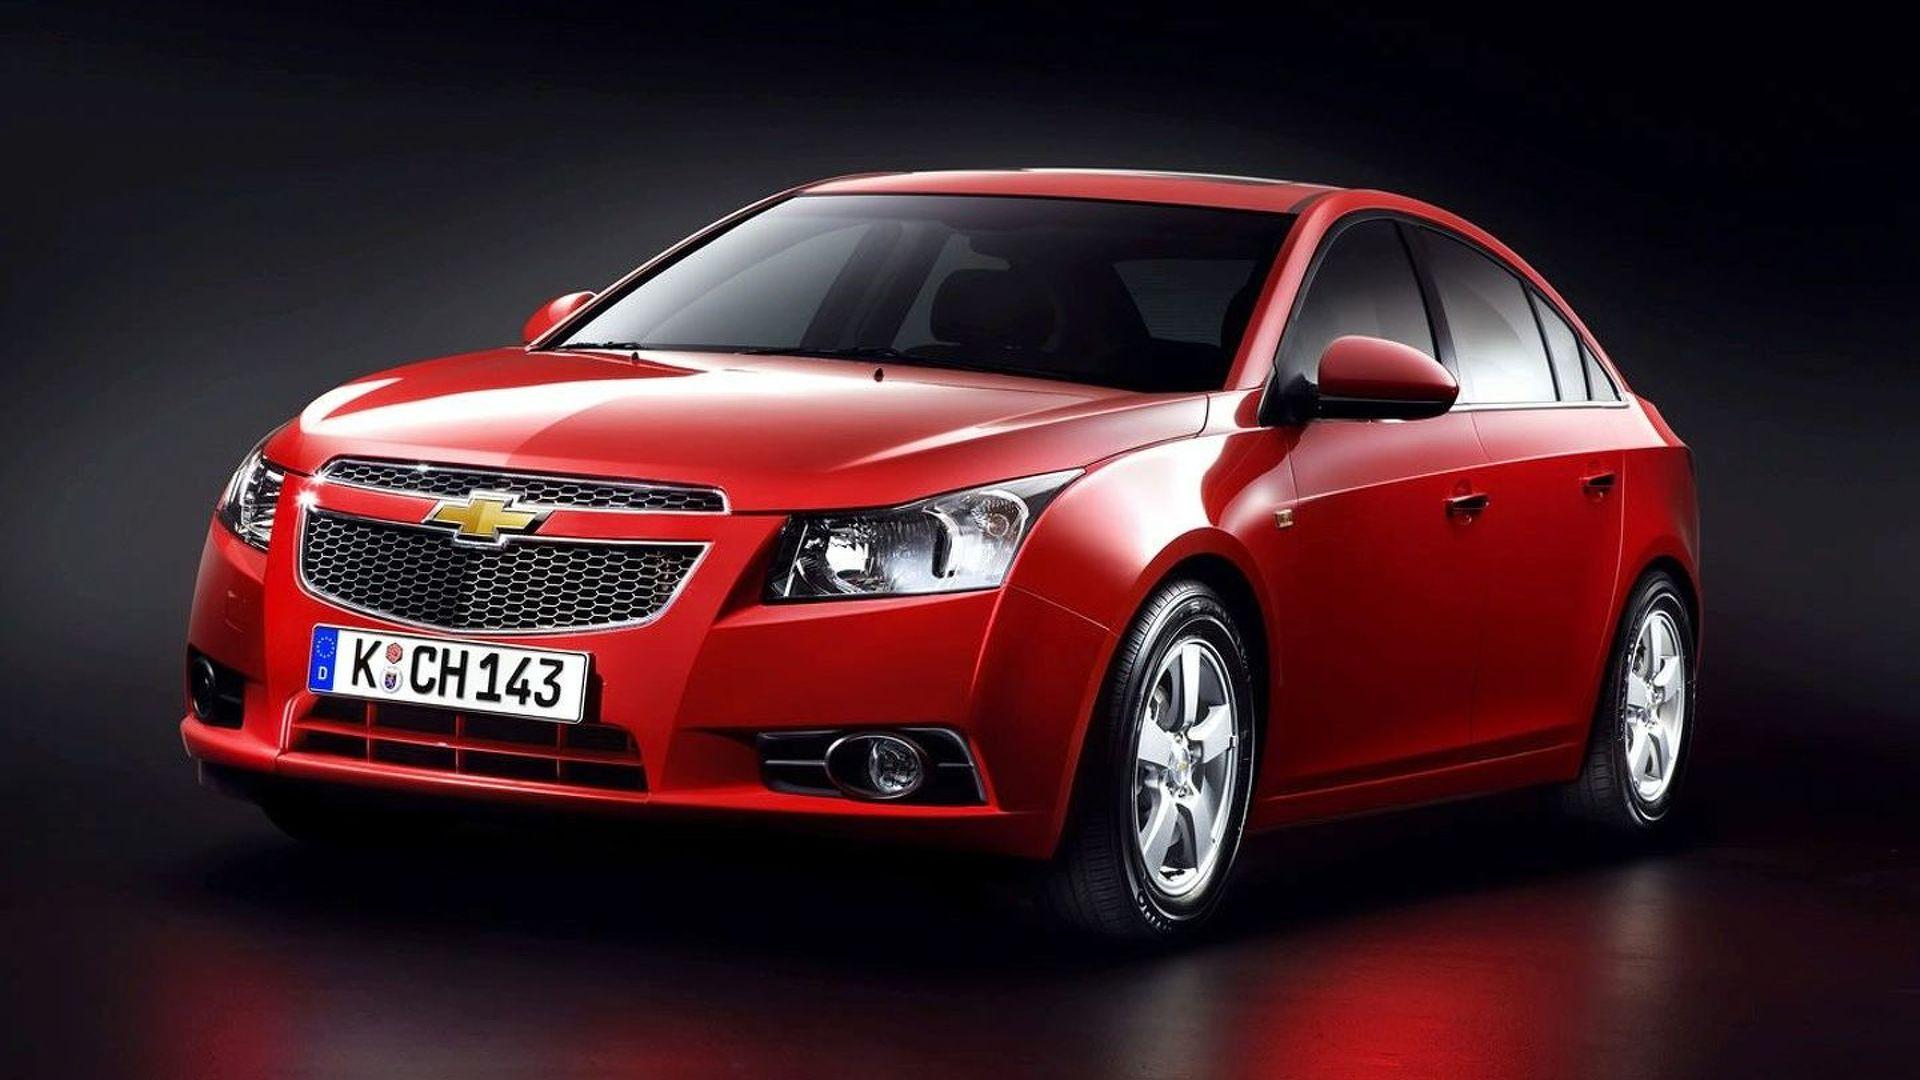 Chevrolet Aggressively Prices Cruze for UK market